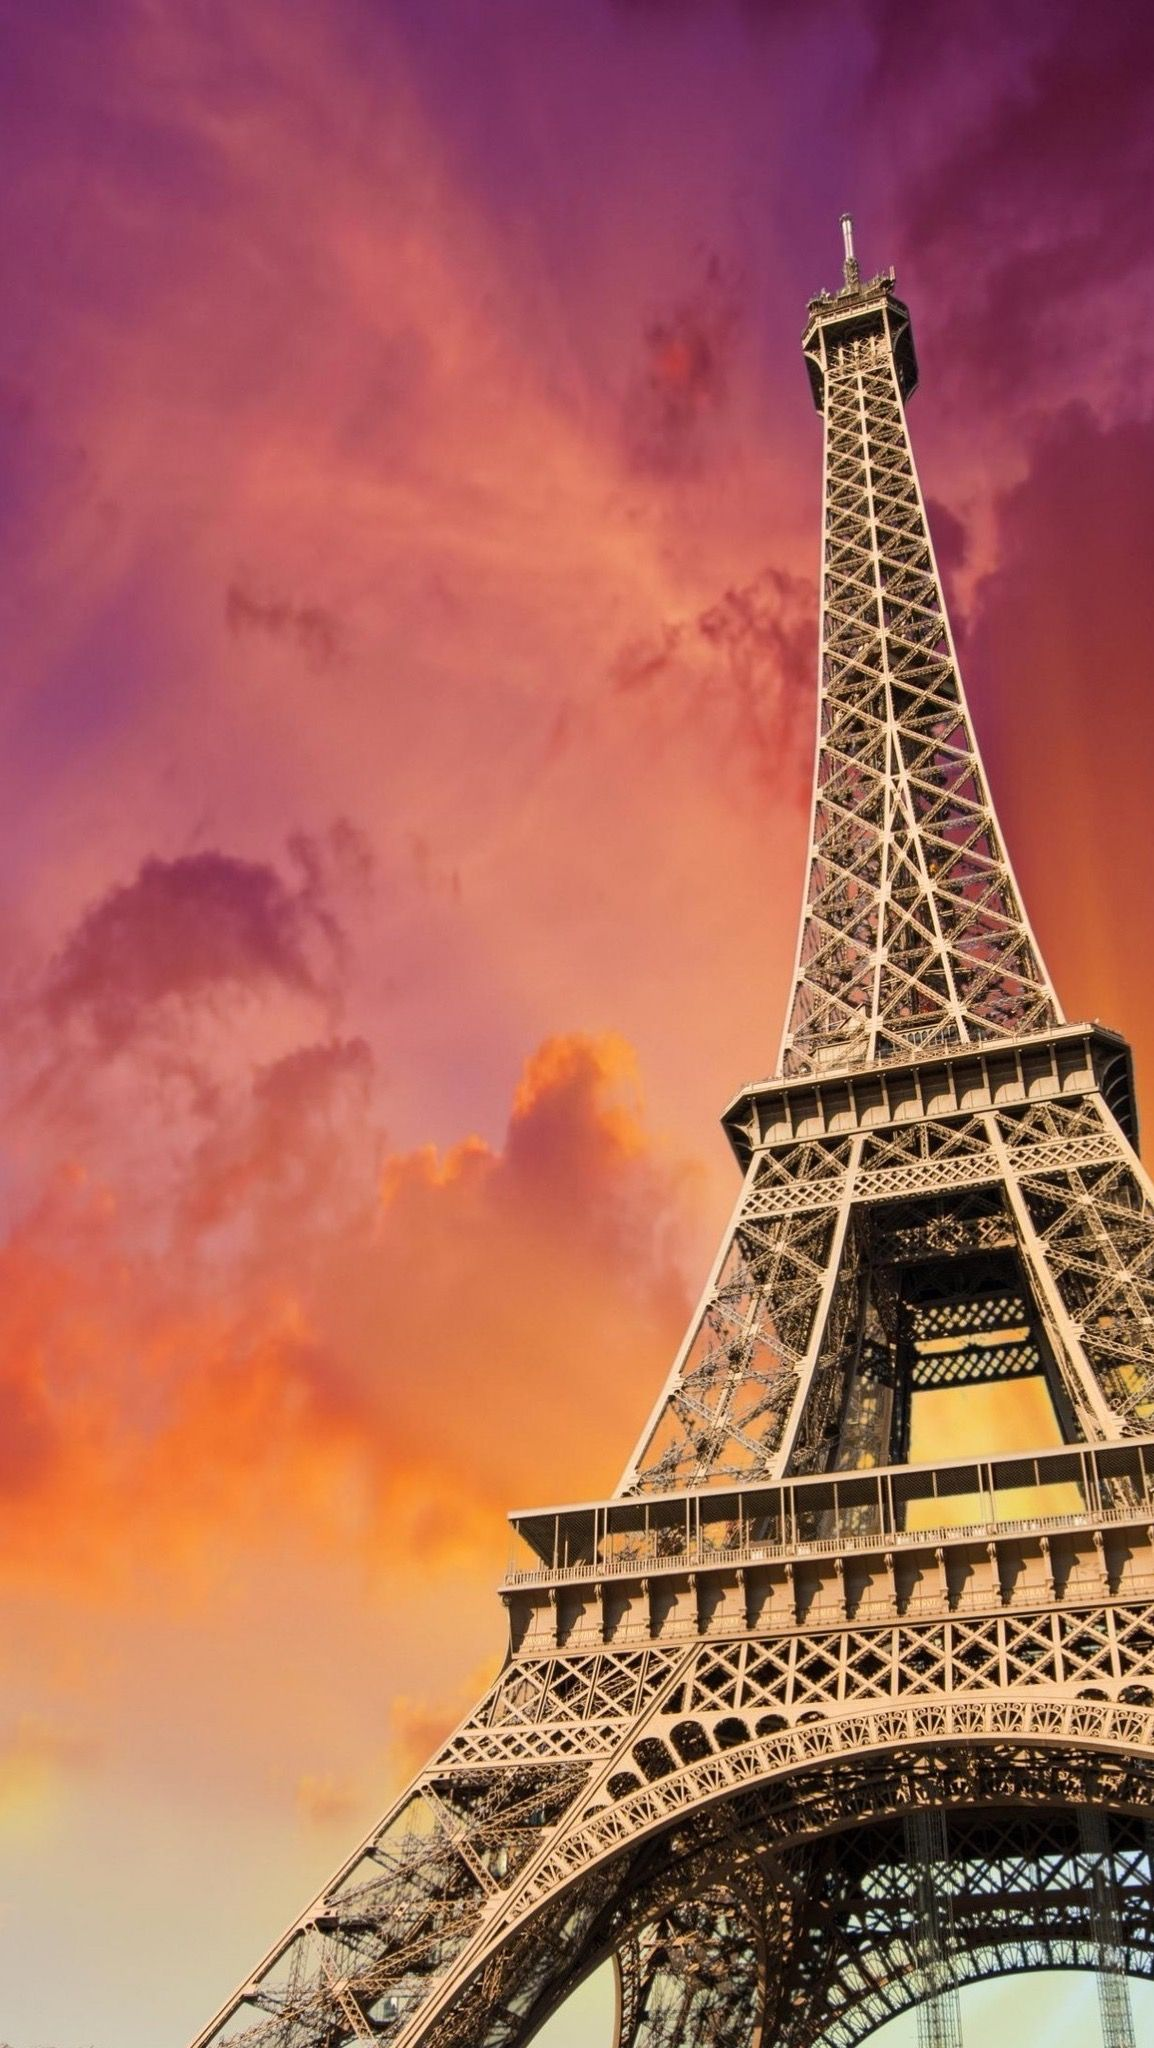 Обои Эйфелева башня, рисунок. Города foto 16